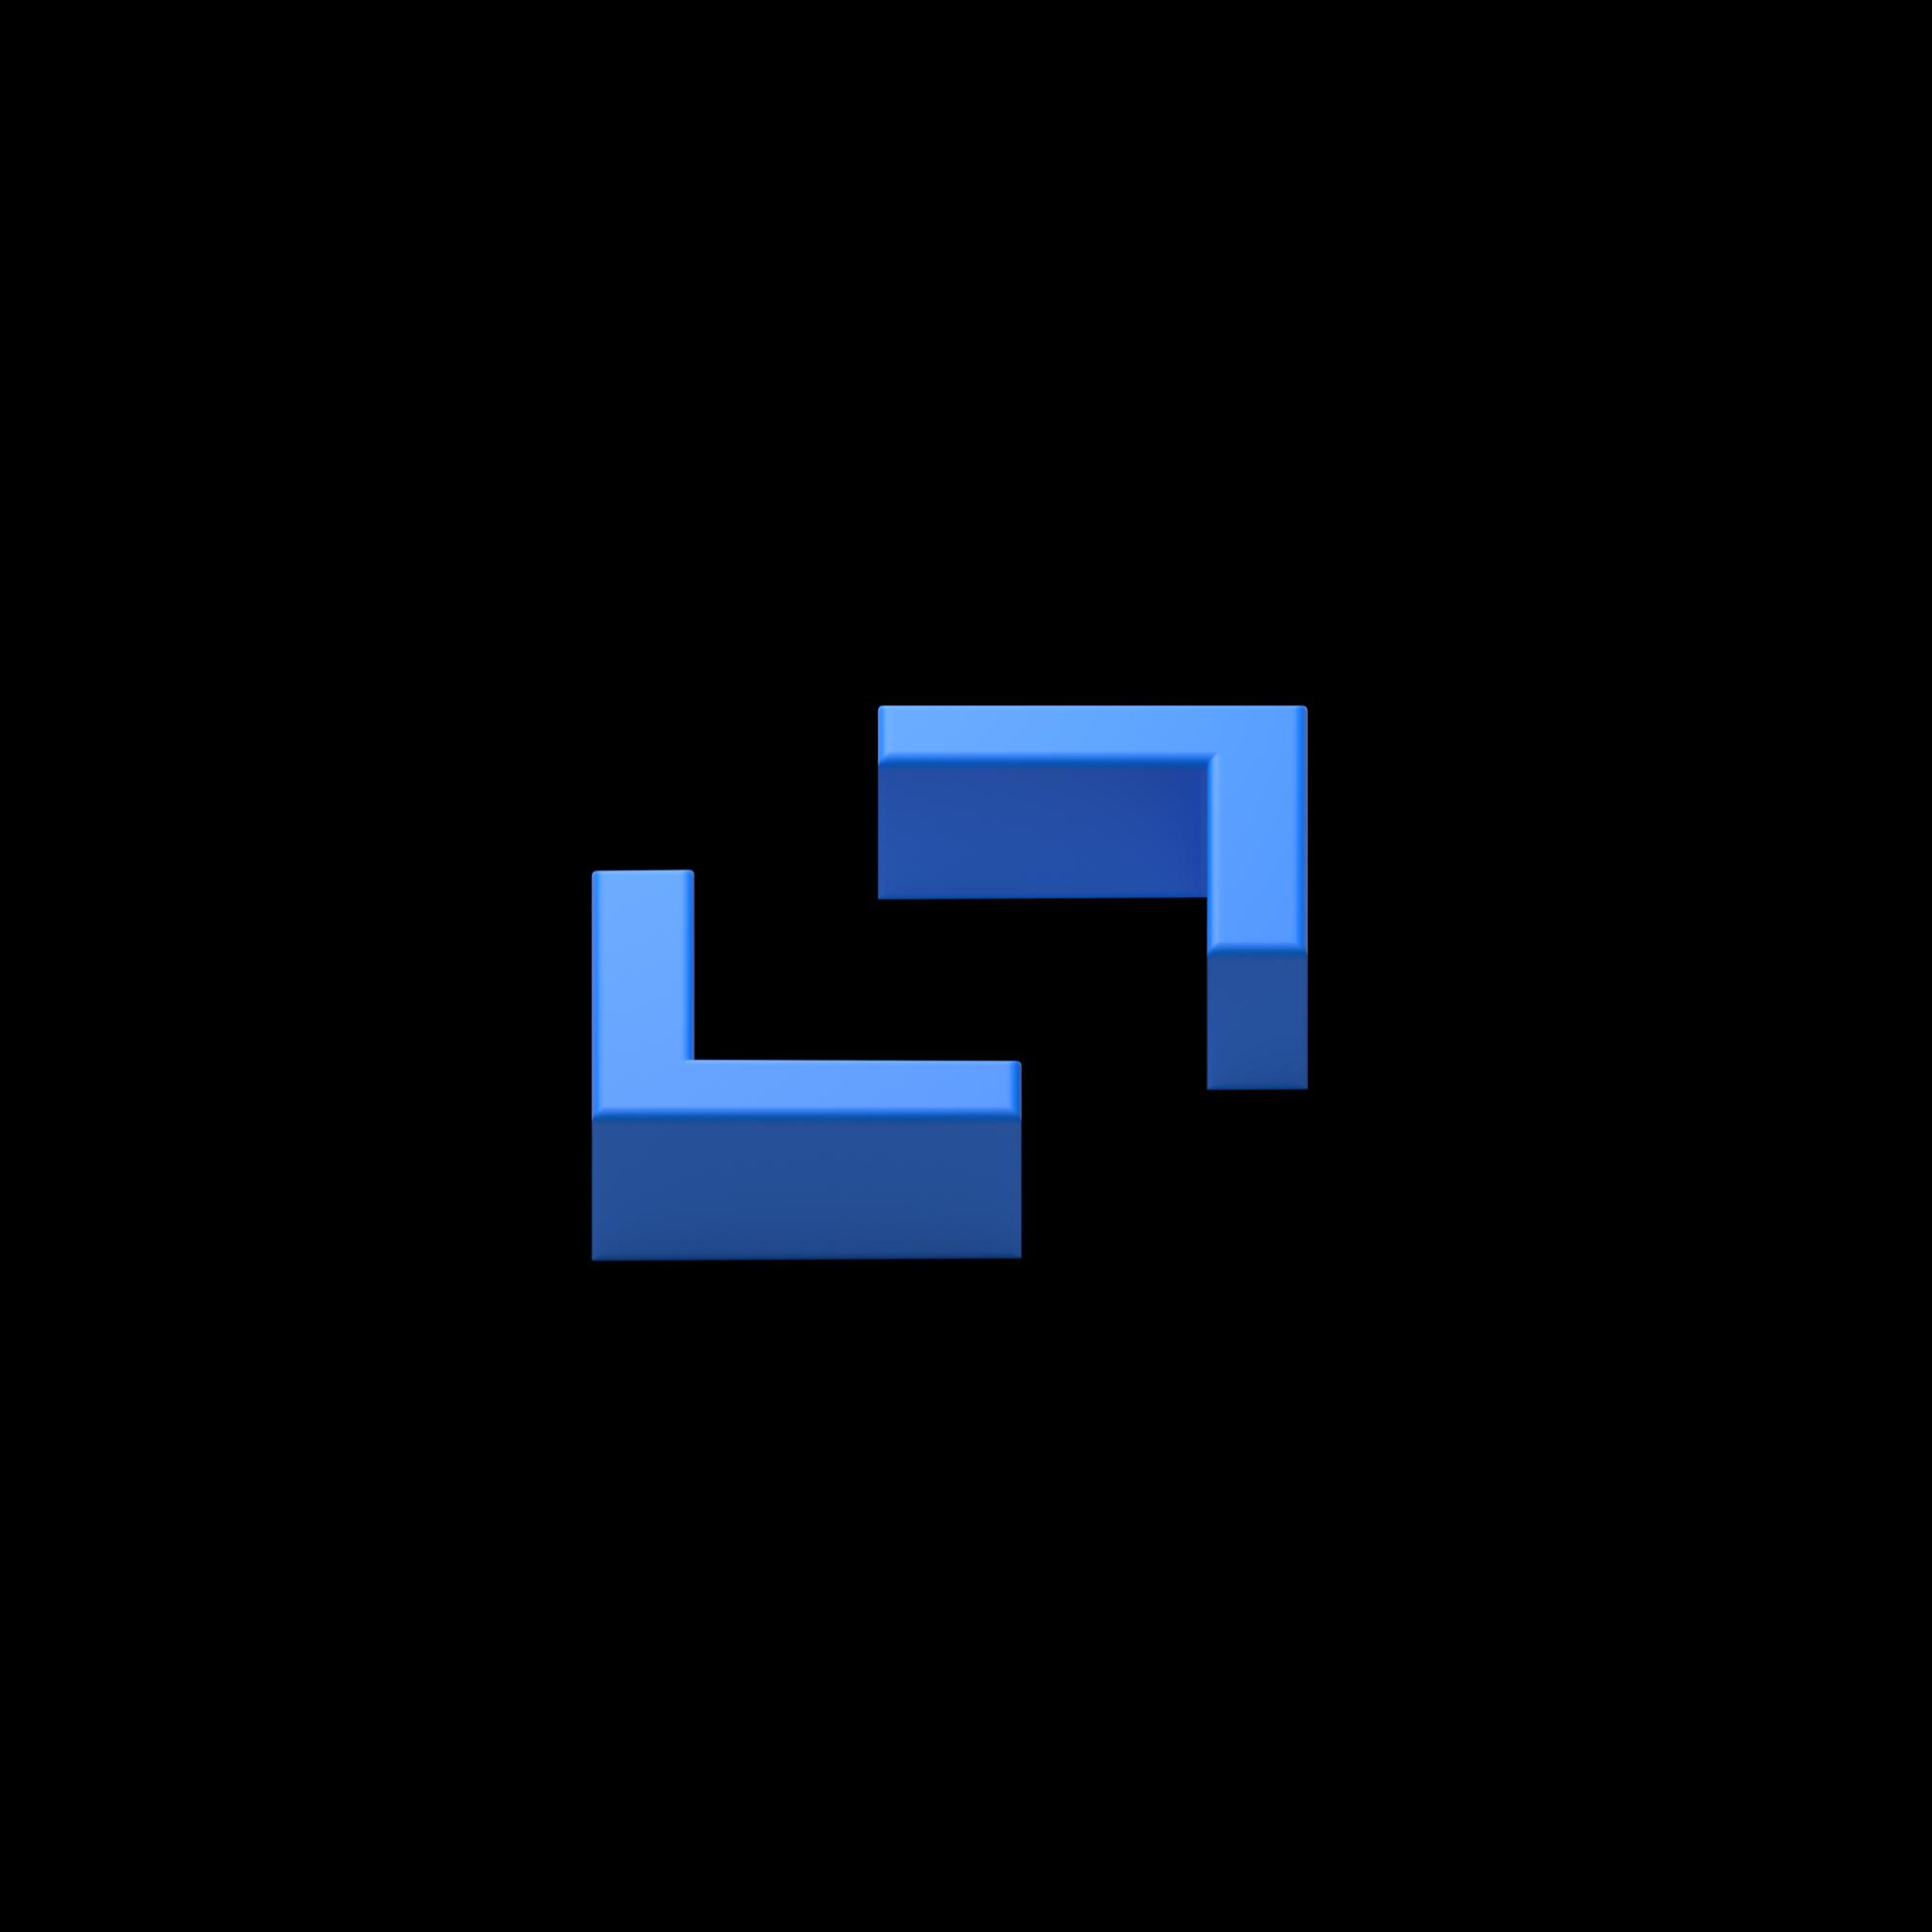 3D coding icon